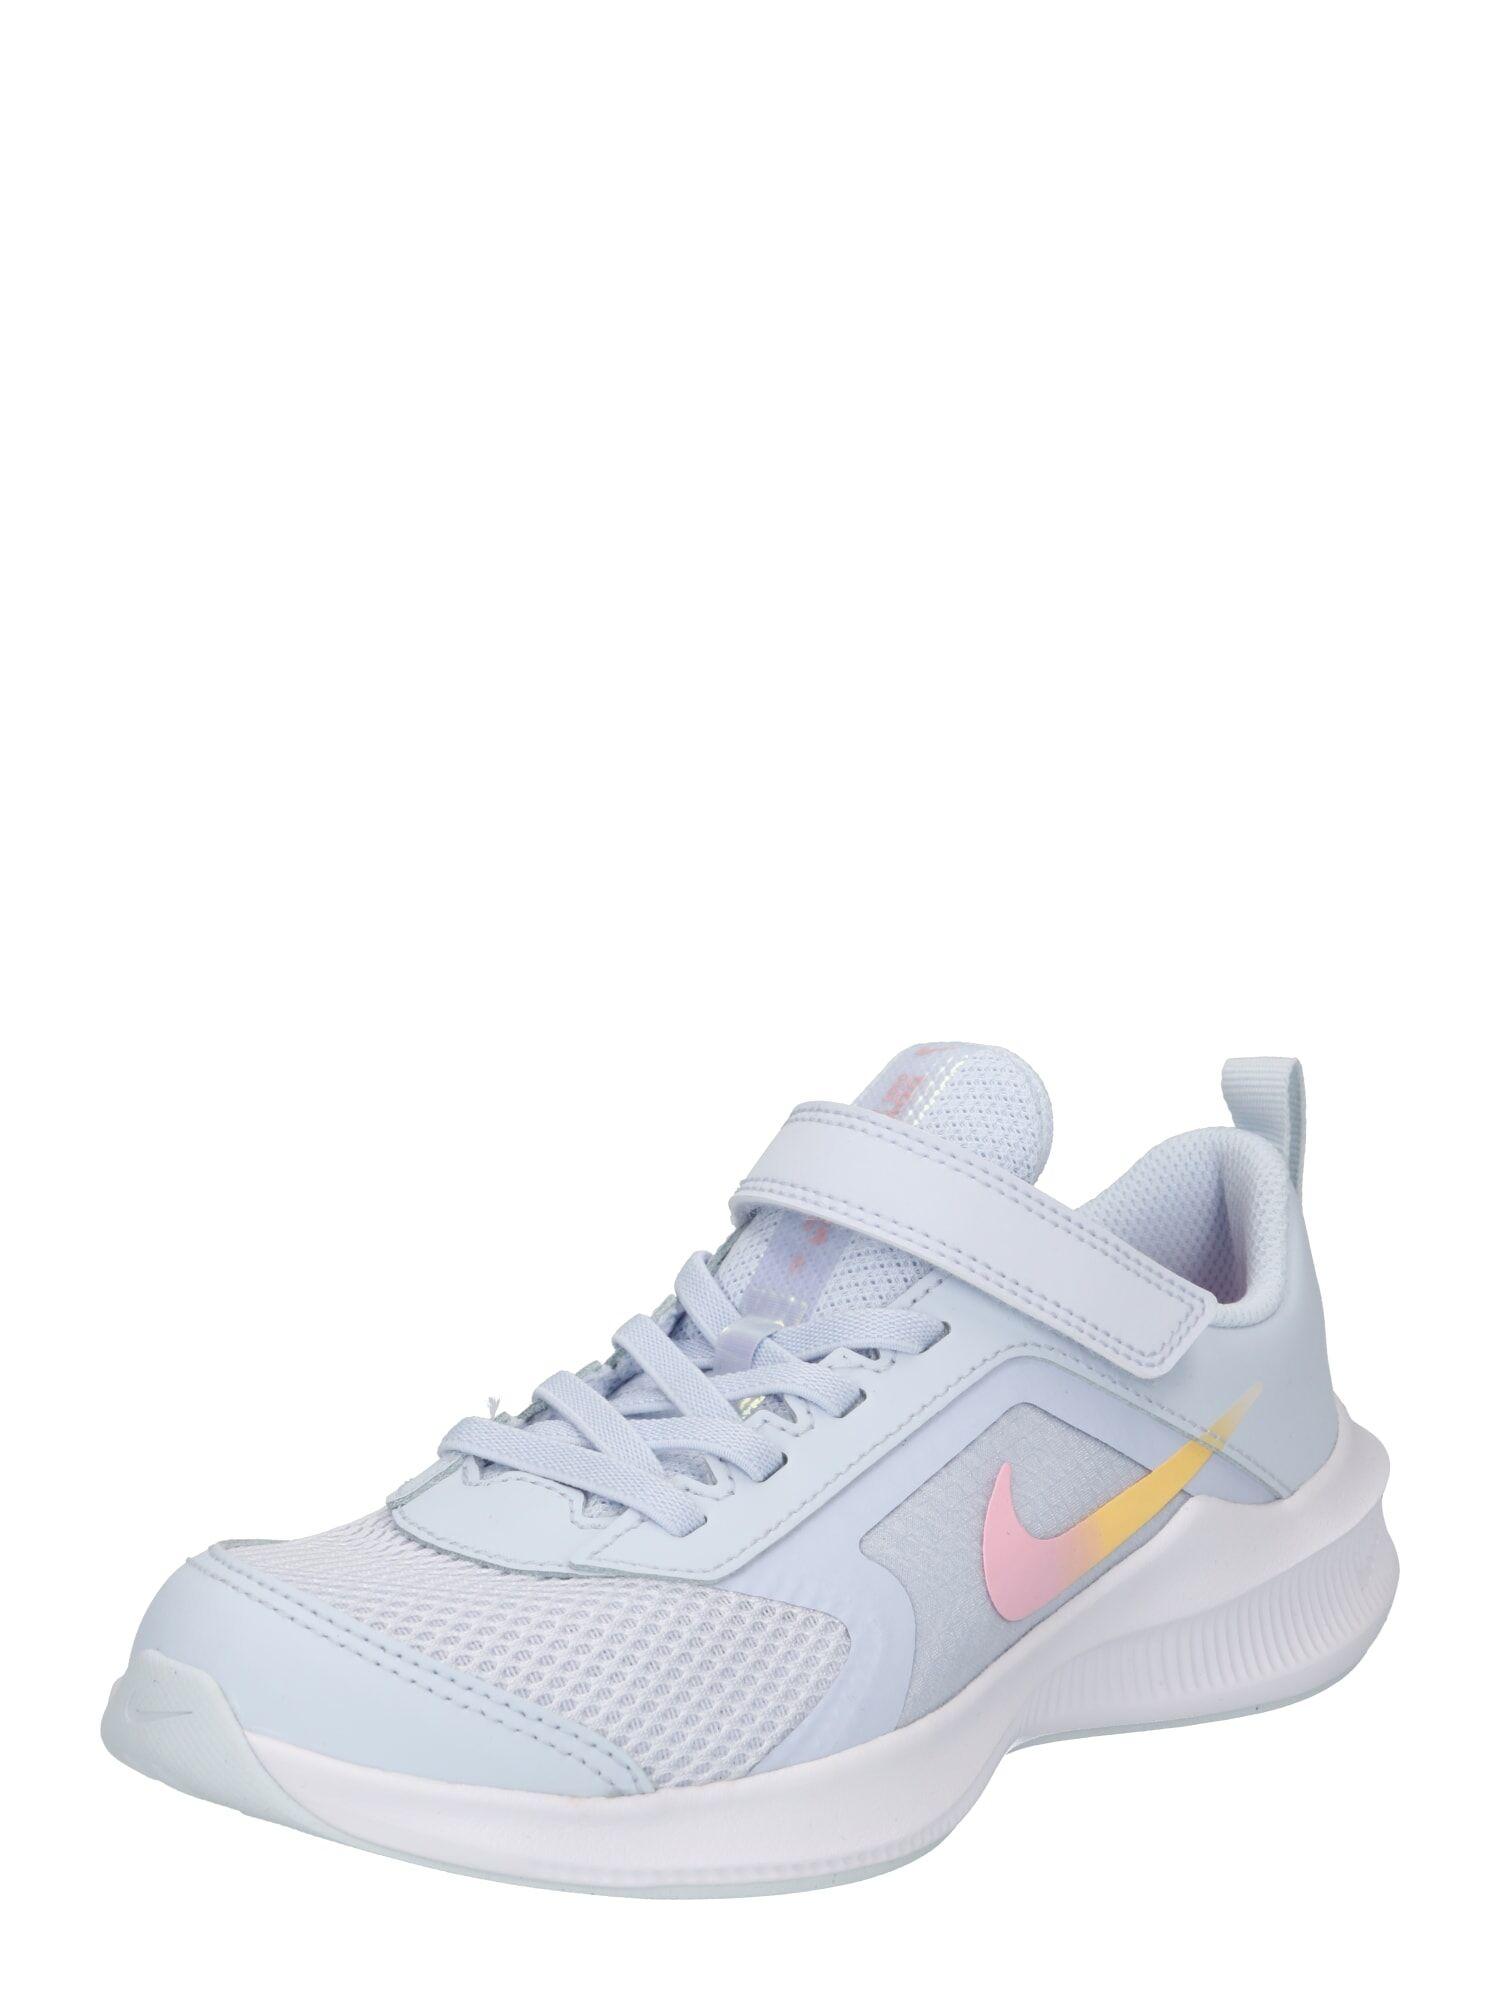 NIKE Chaussure de sport 'Downshifter 11'  - Gris - Taille: 3Y - boy